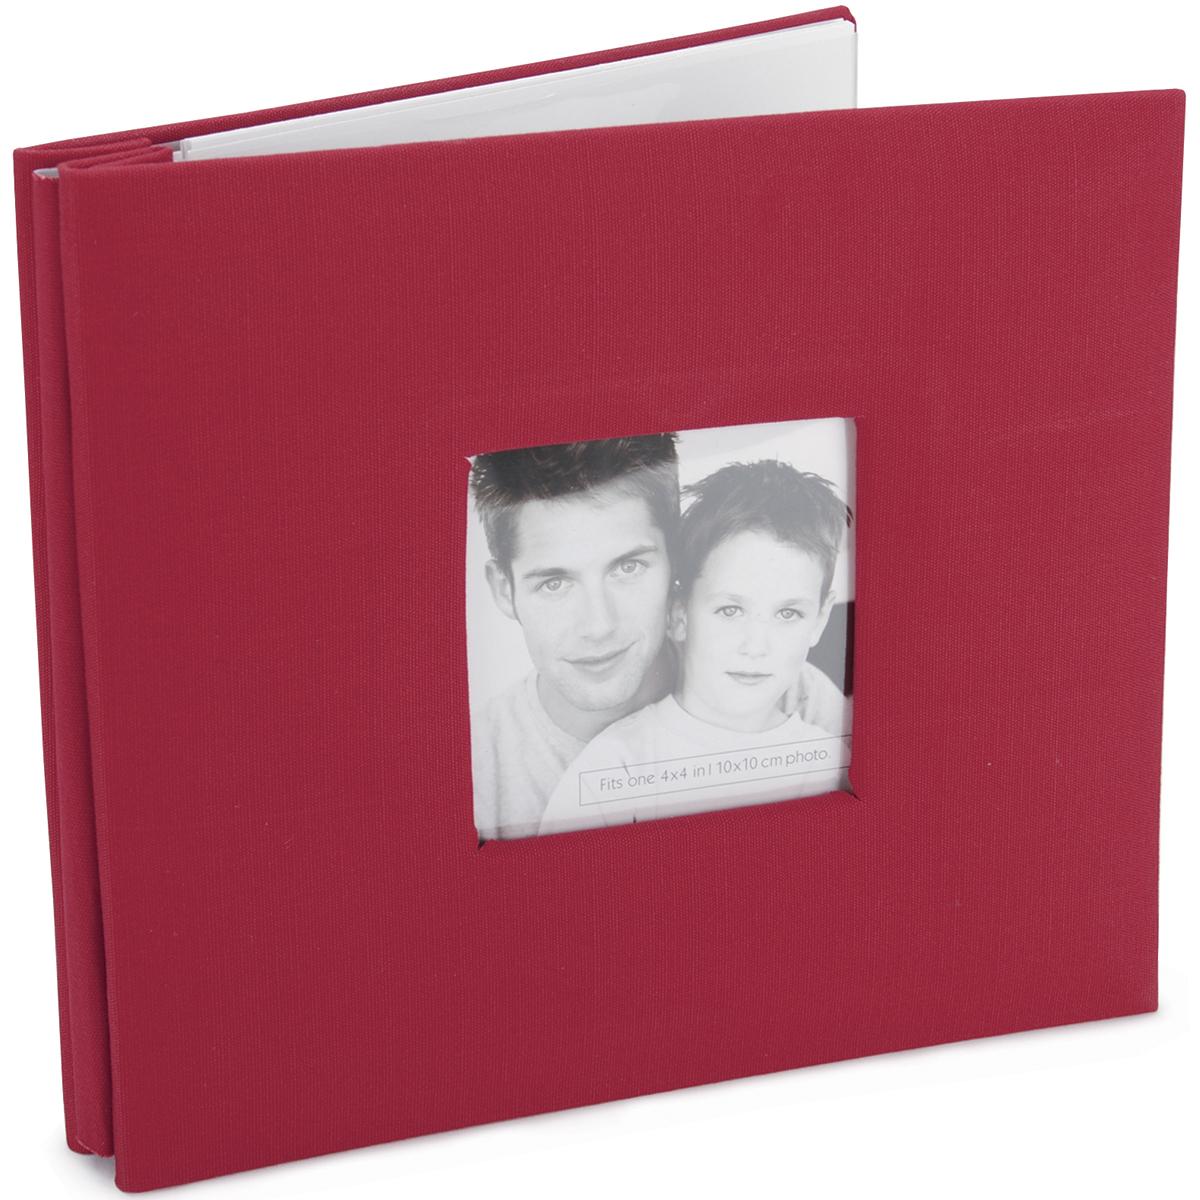 Red Fashion Fabirc 8X8 Album